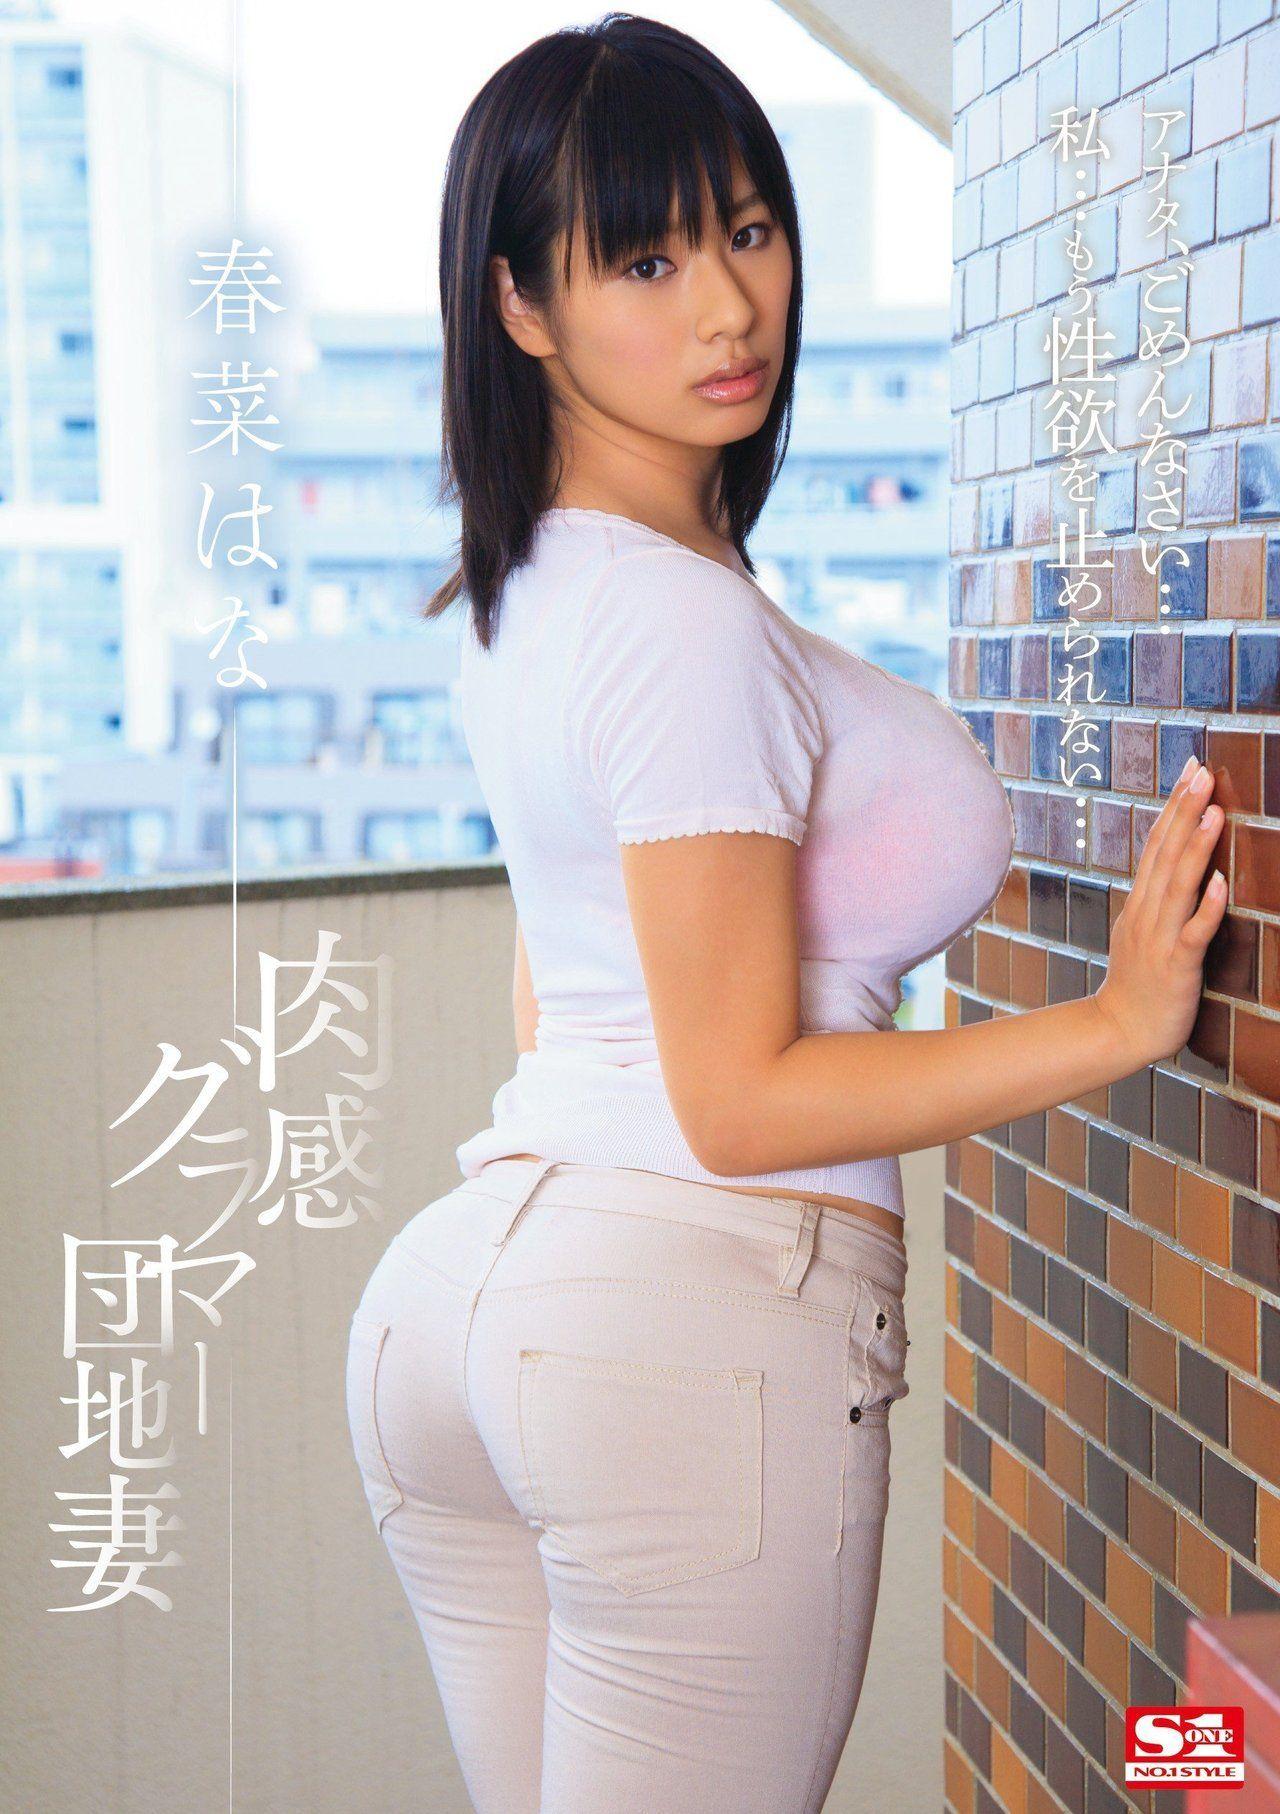 Haruna Hana 春菜はな Kカップ 爆乳 Av女優 Hana Di 2019 Hana